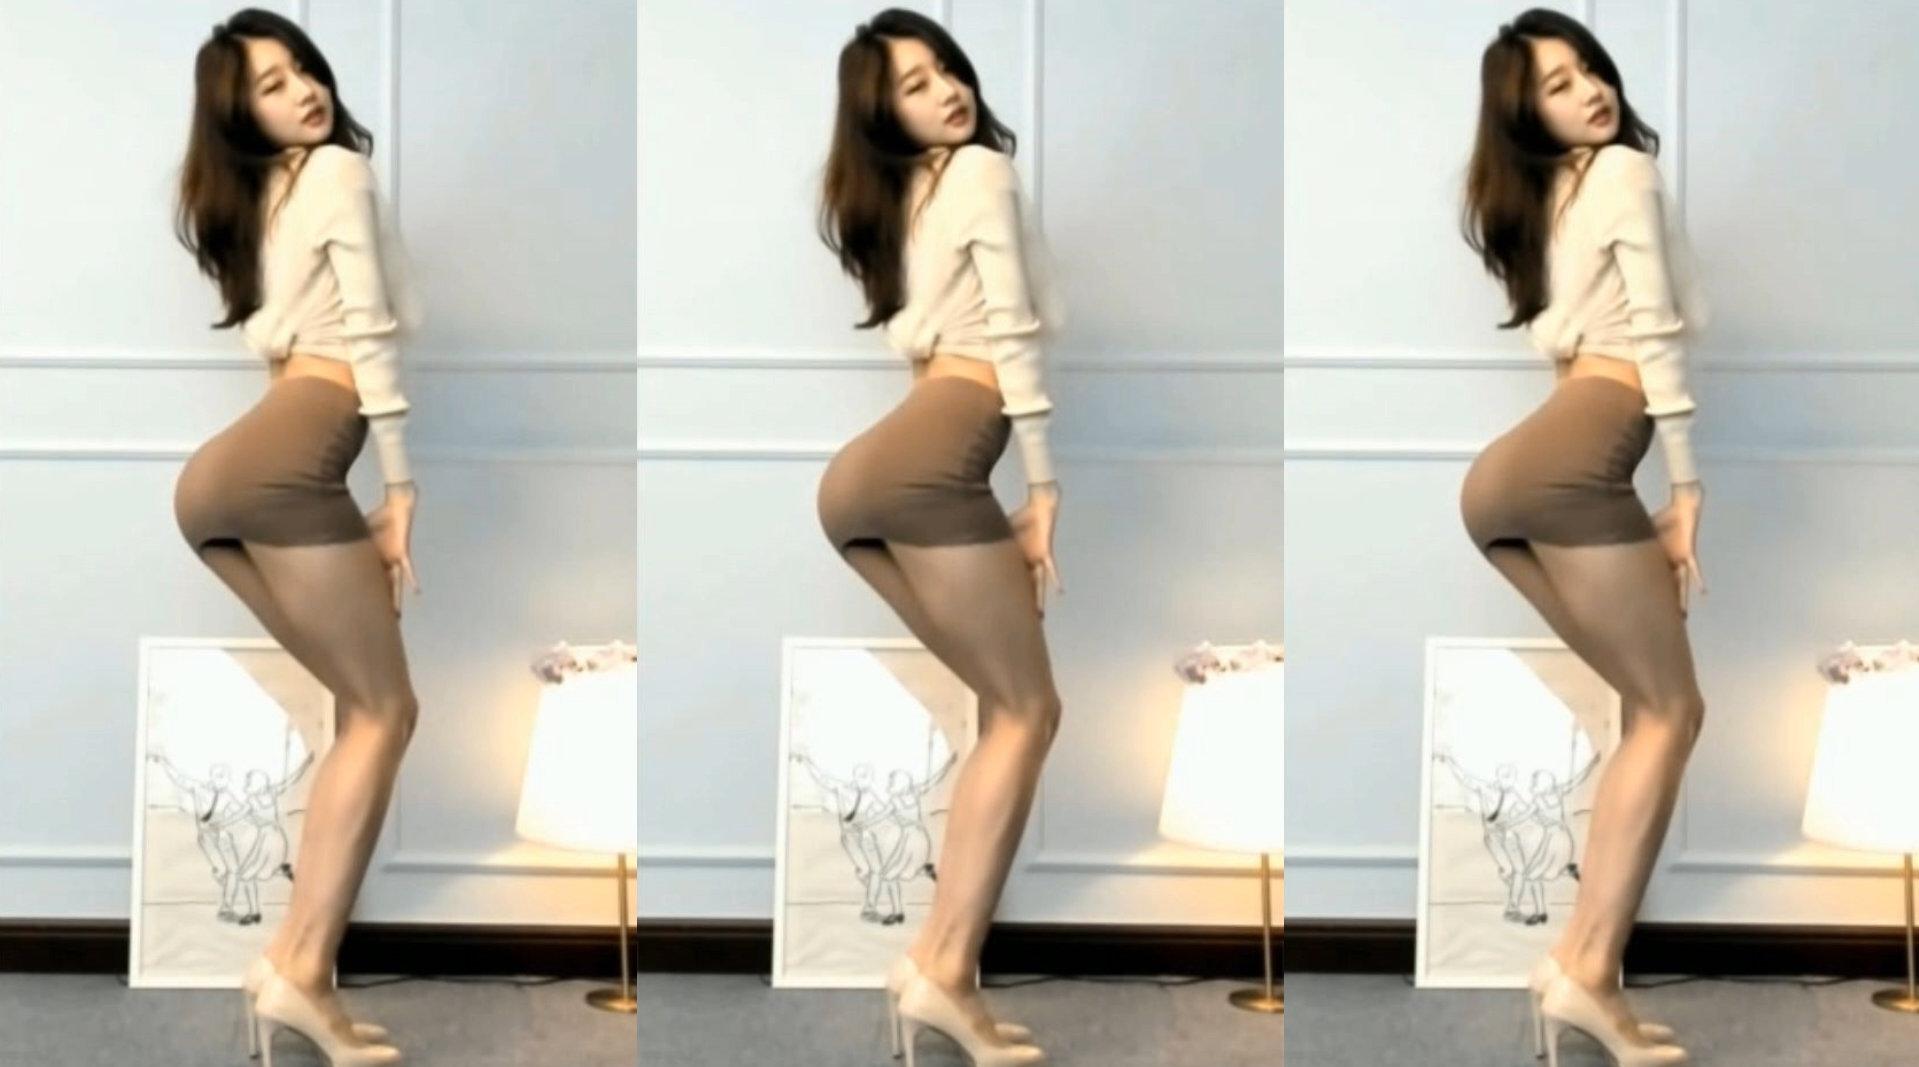 BJ서아徐雅 饭拍(BGM:Babe - HyunA泫雅)2019 7 2